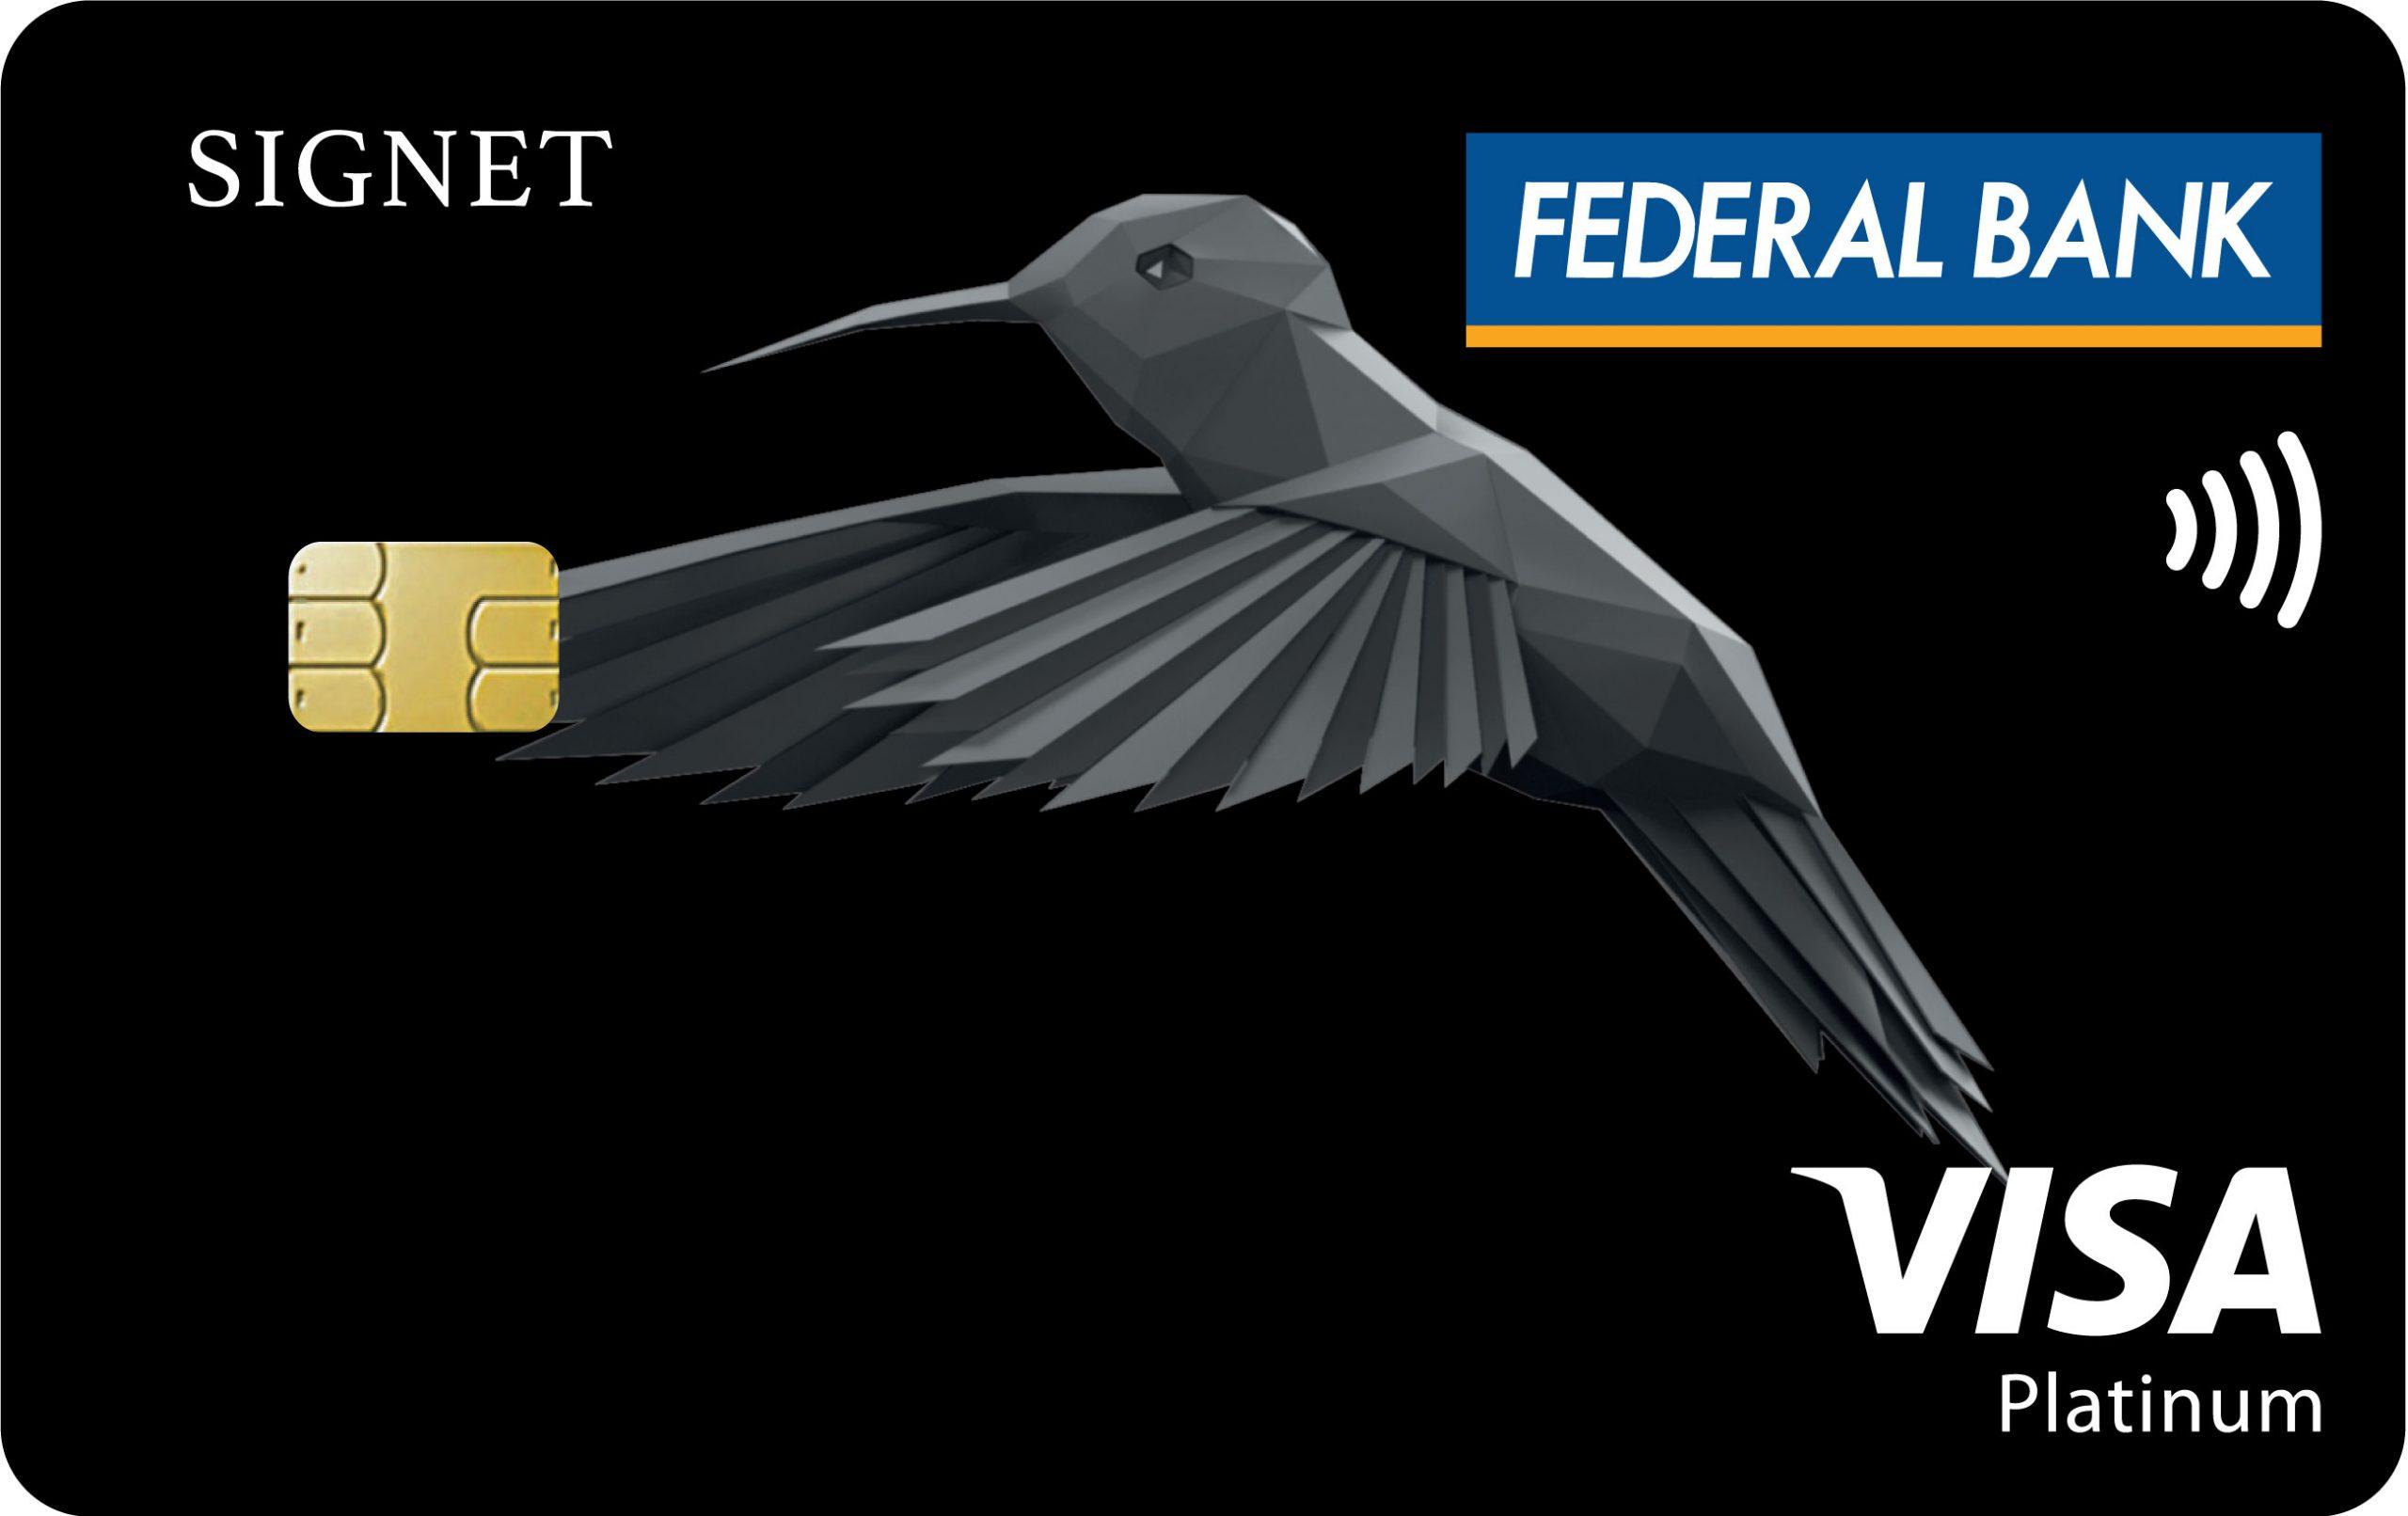 Federal Bank Signet Visa Credit Card